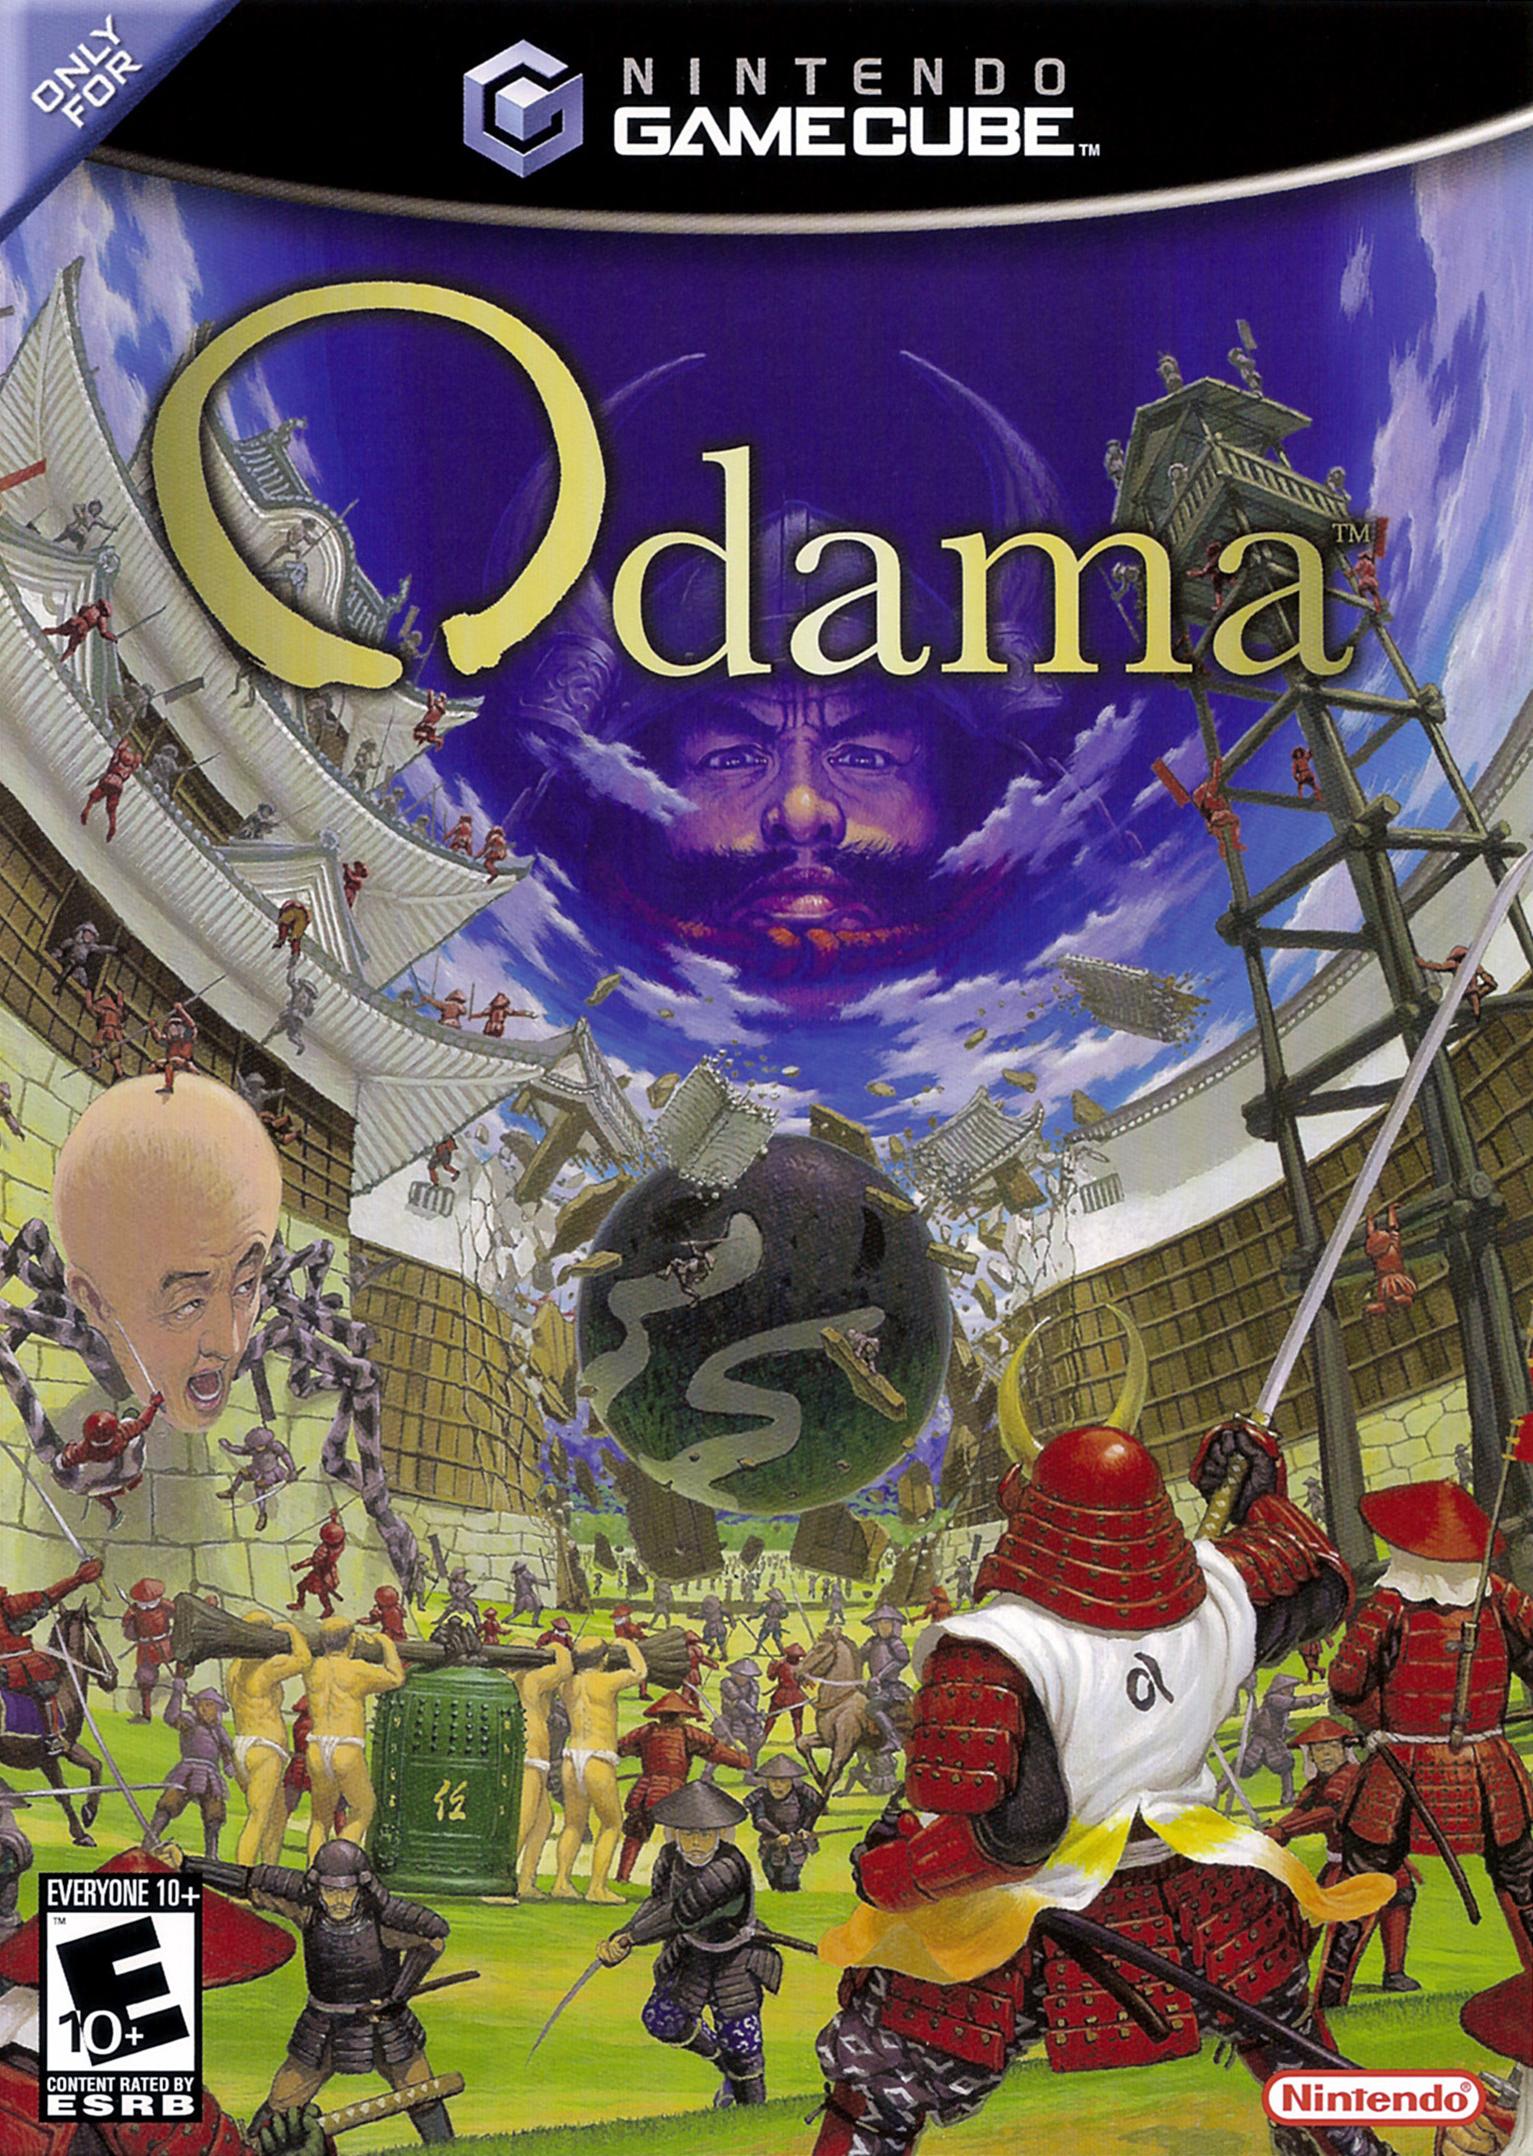 Odama/GameCube